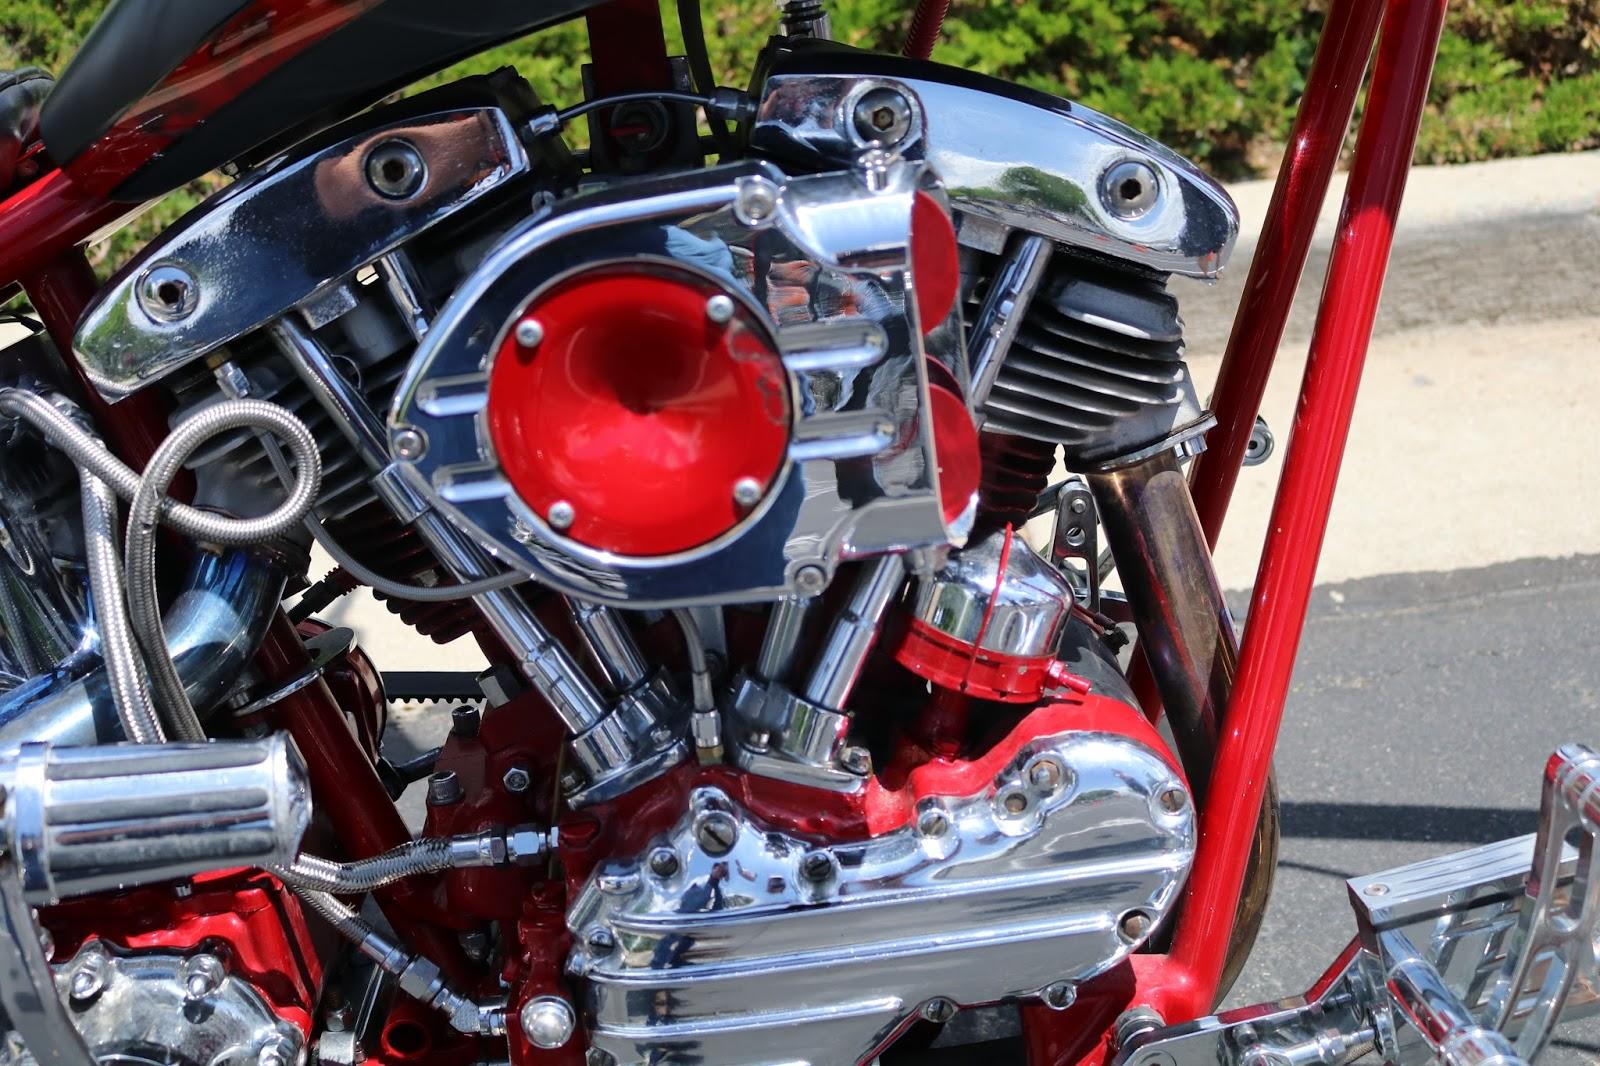 Oldmotodude Harley Davidson Chopper On Display At The